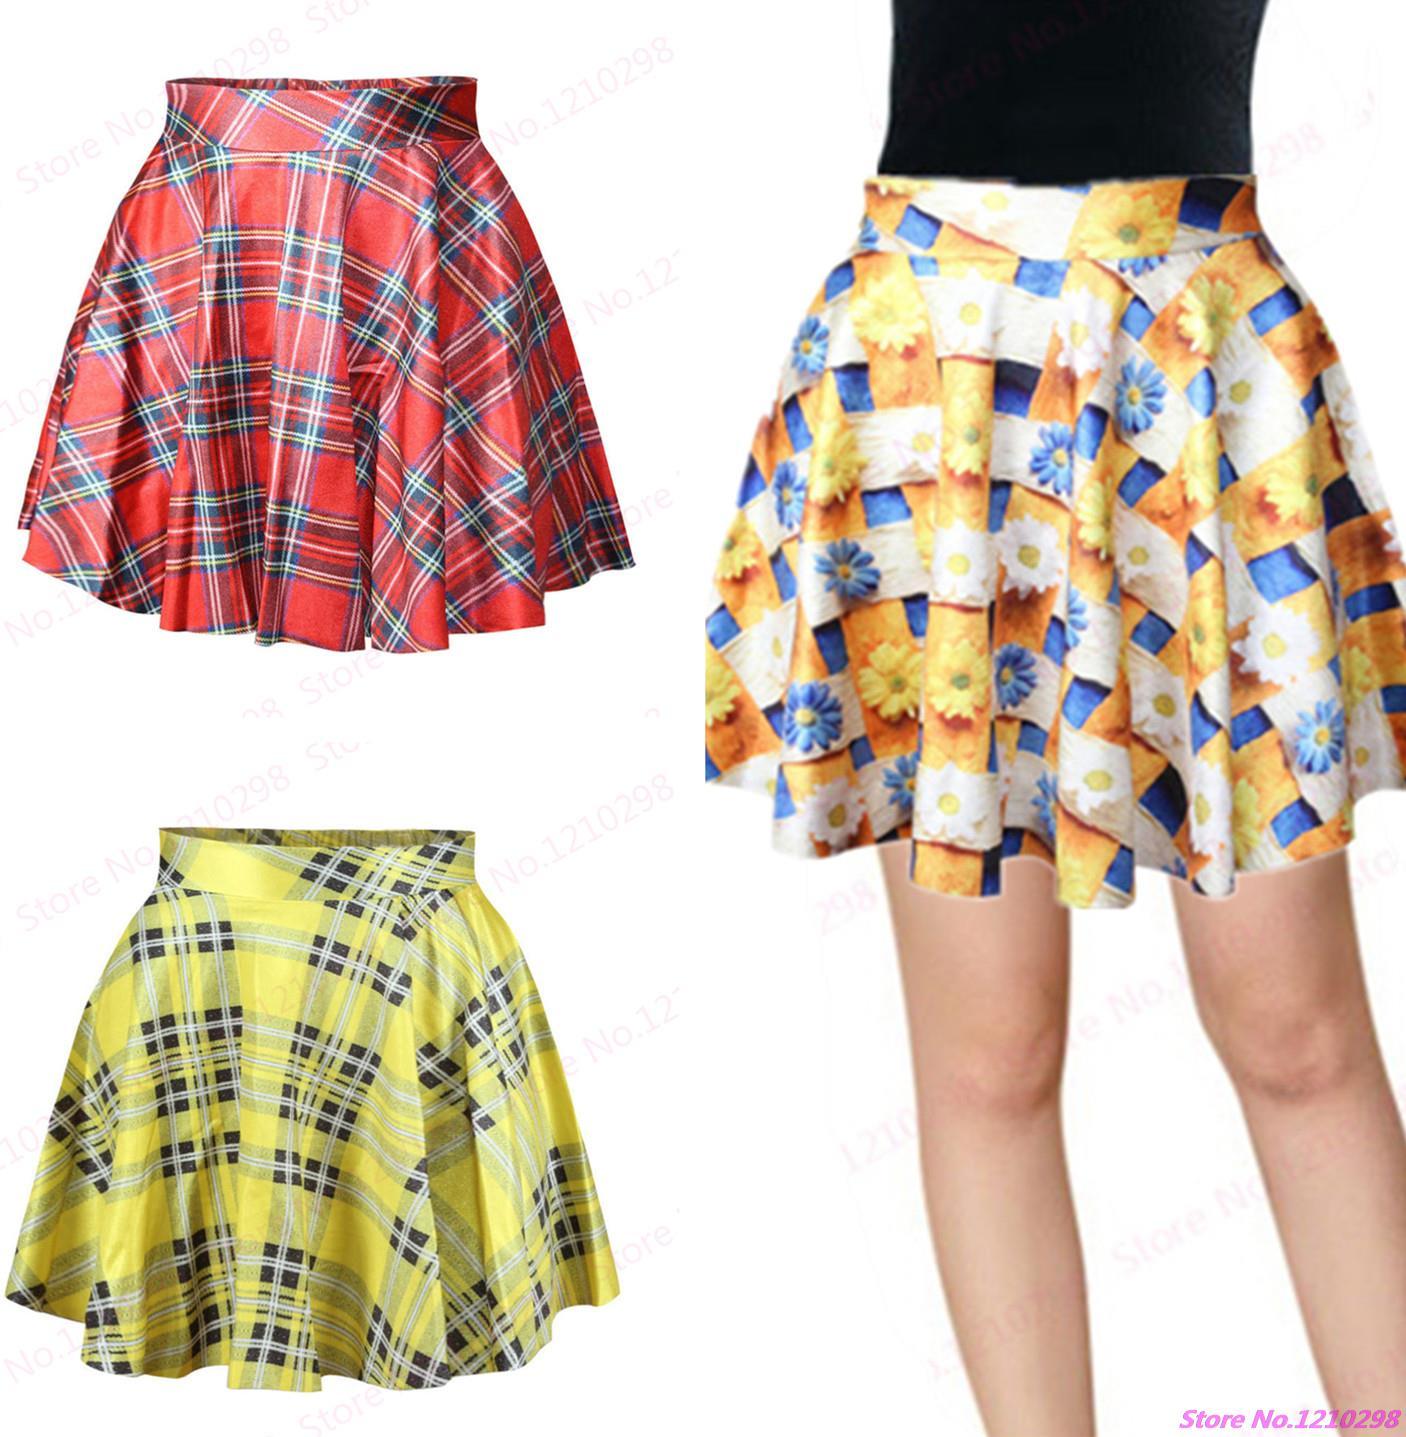 c75c433d6 Printed Red Chrysanthemum Miniskirt Cute School Pettiskirt Tutu Skirt Young  Girls Grid Tennis Short Skirts Yellow For Summer